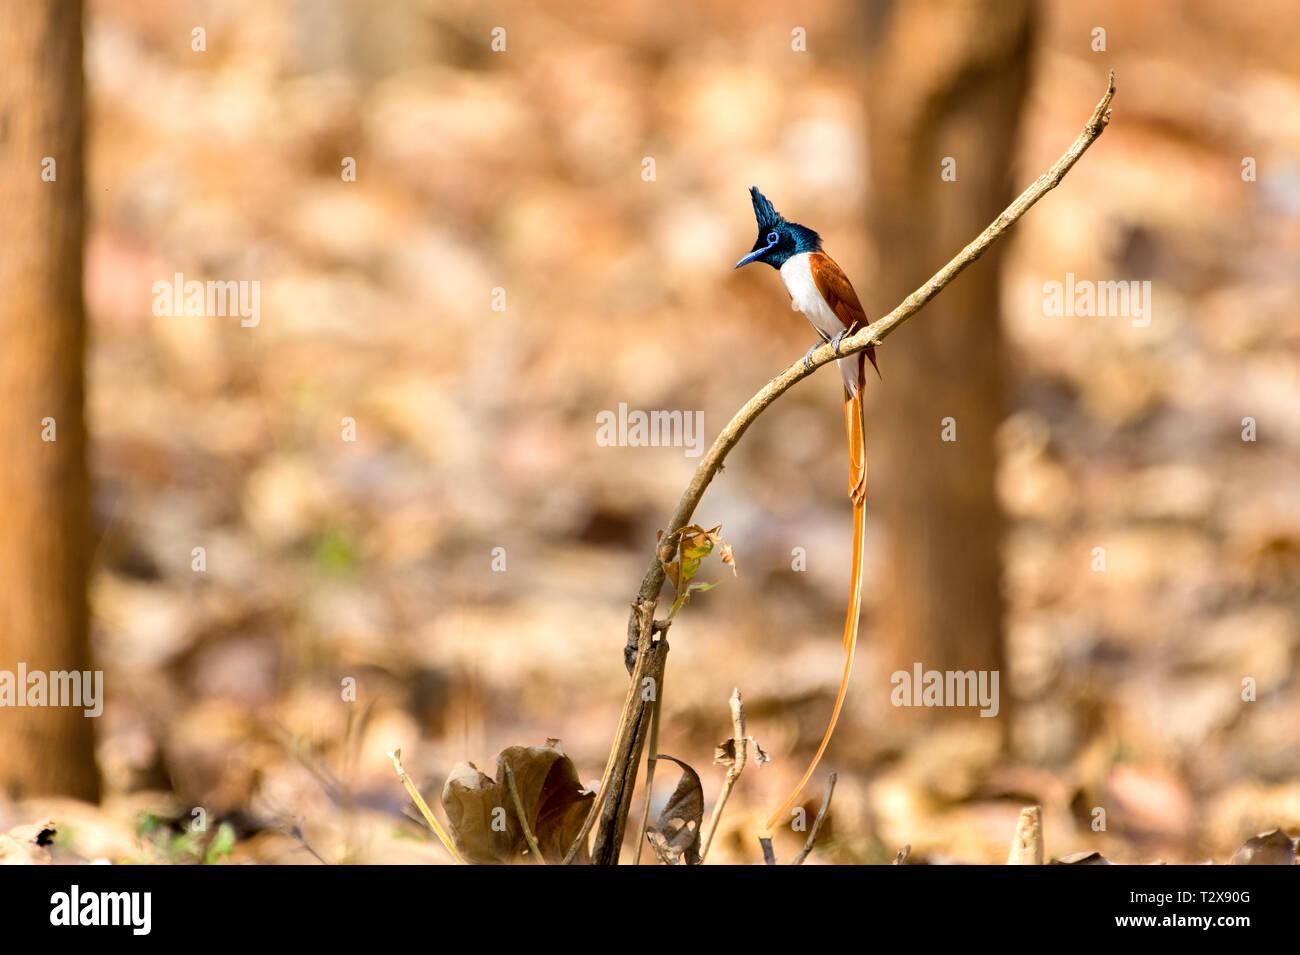 Indian paradise flycatcher - Stock Image